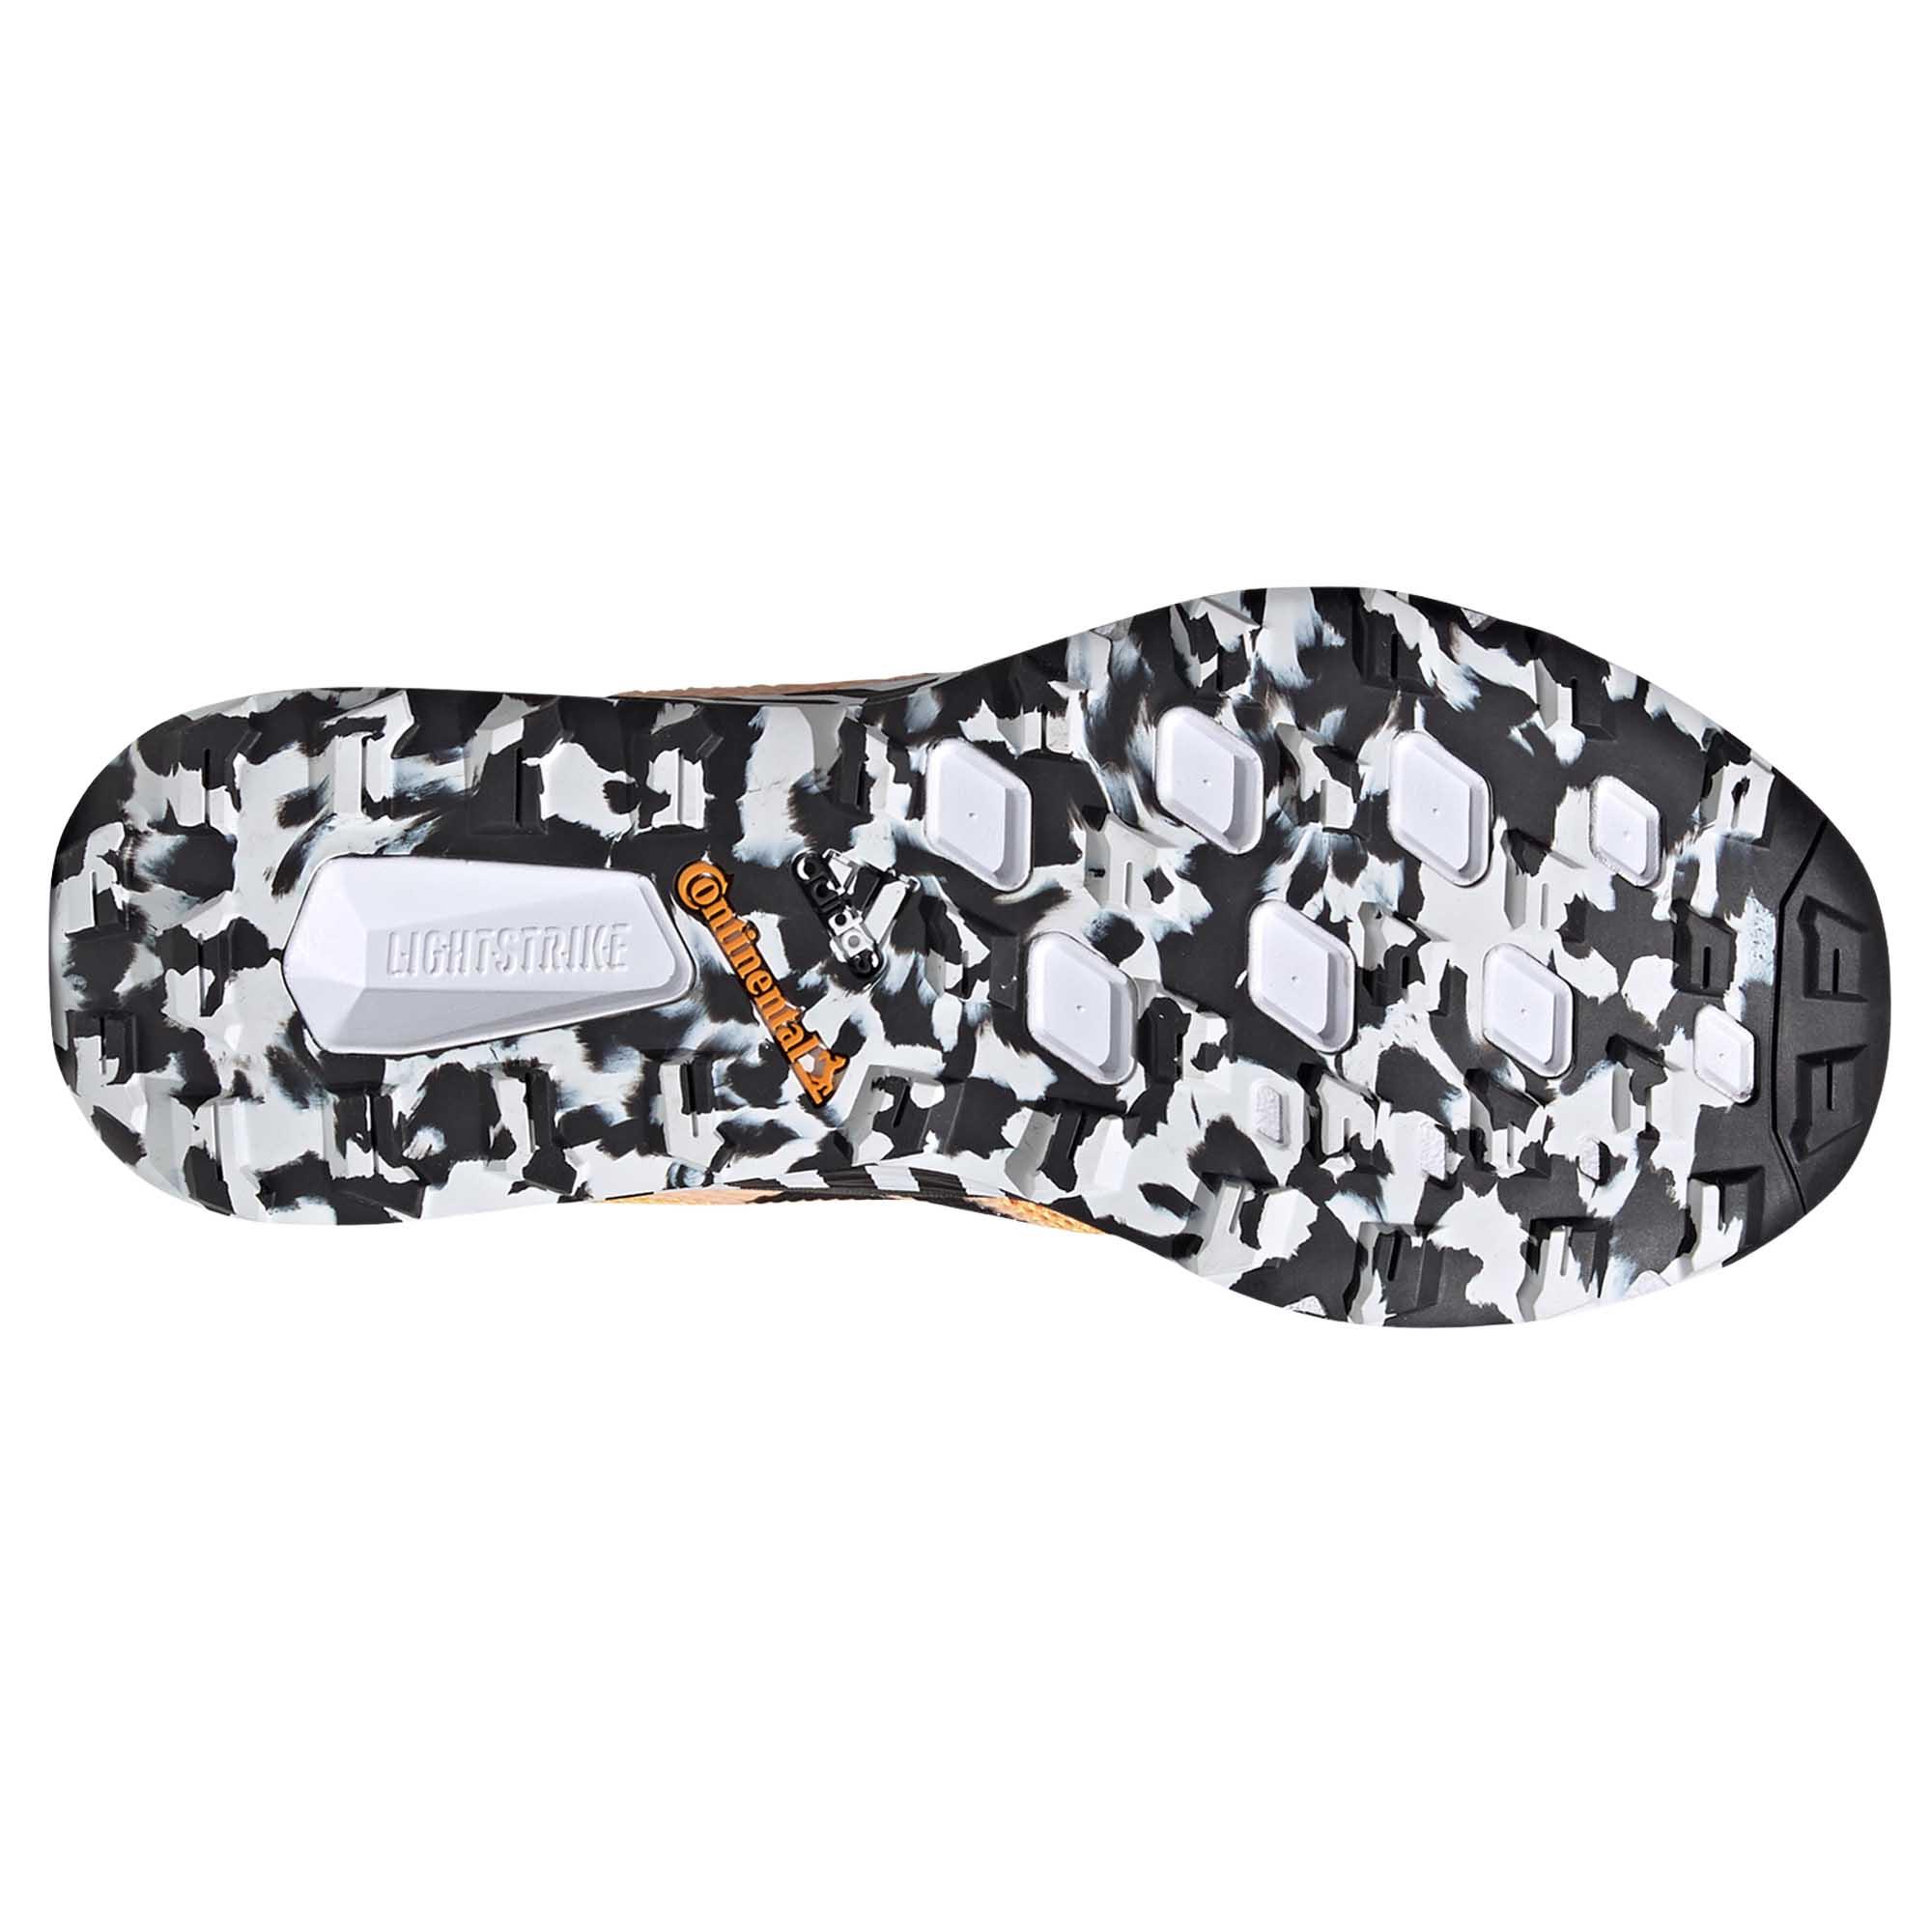 miniature 7 - Adidas Terrex deux homme trail running Trainer Shoe Or/Noir/Blanc